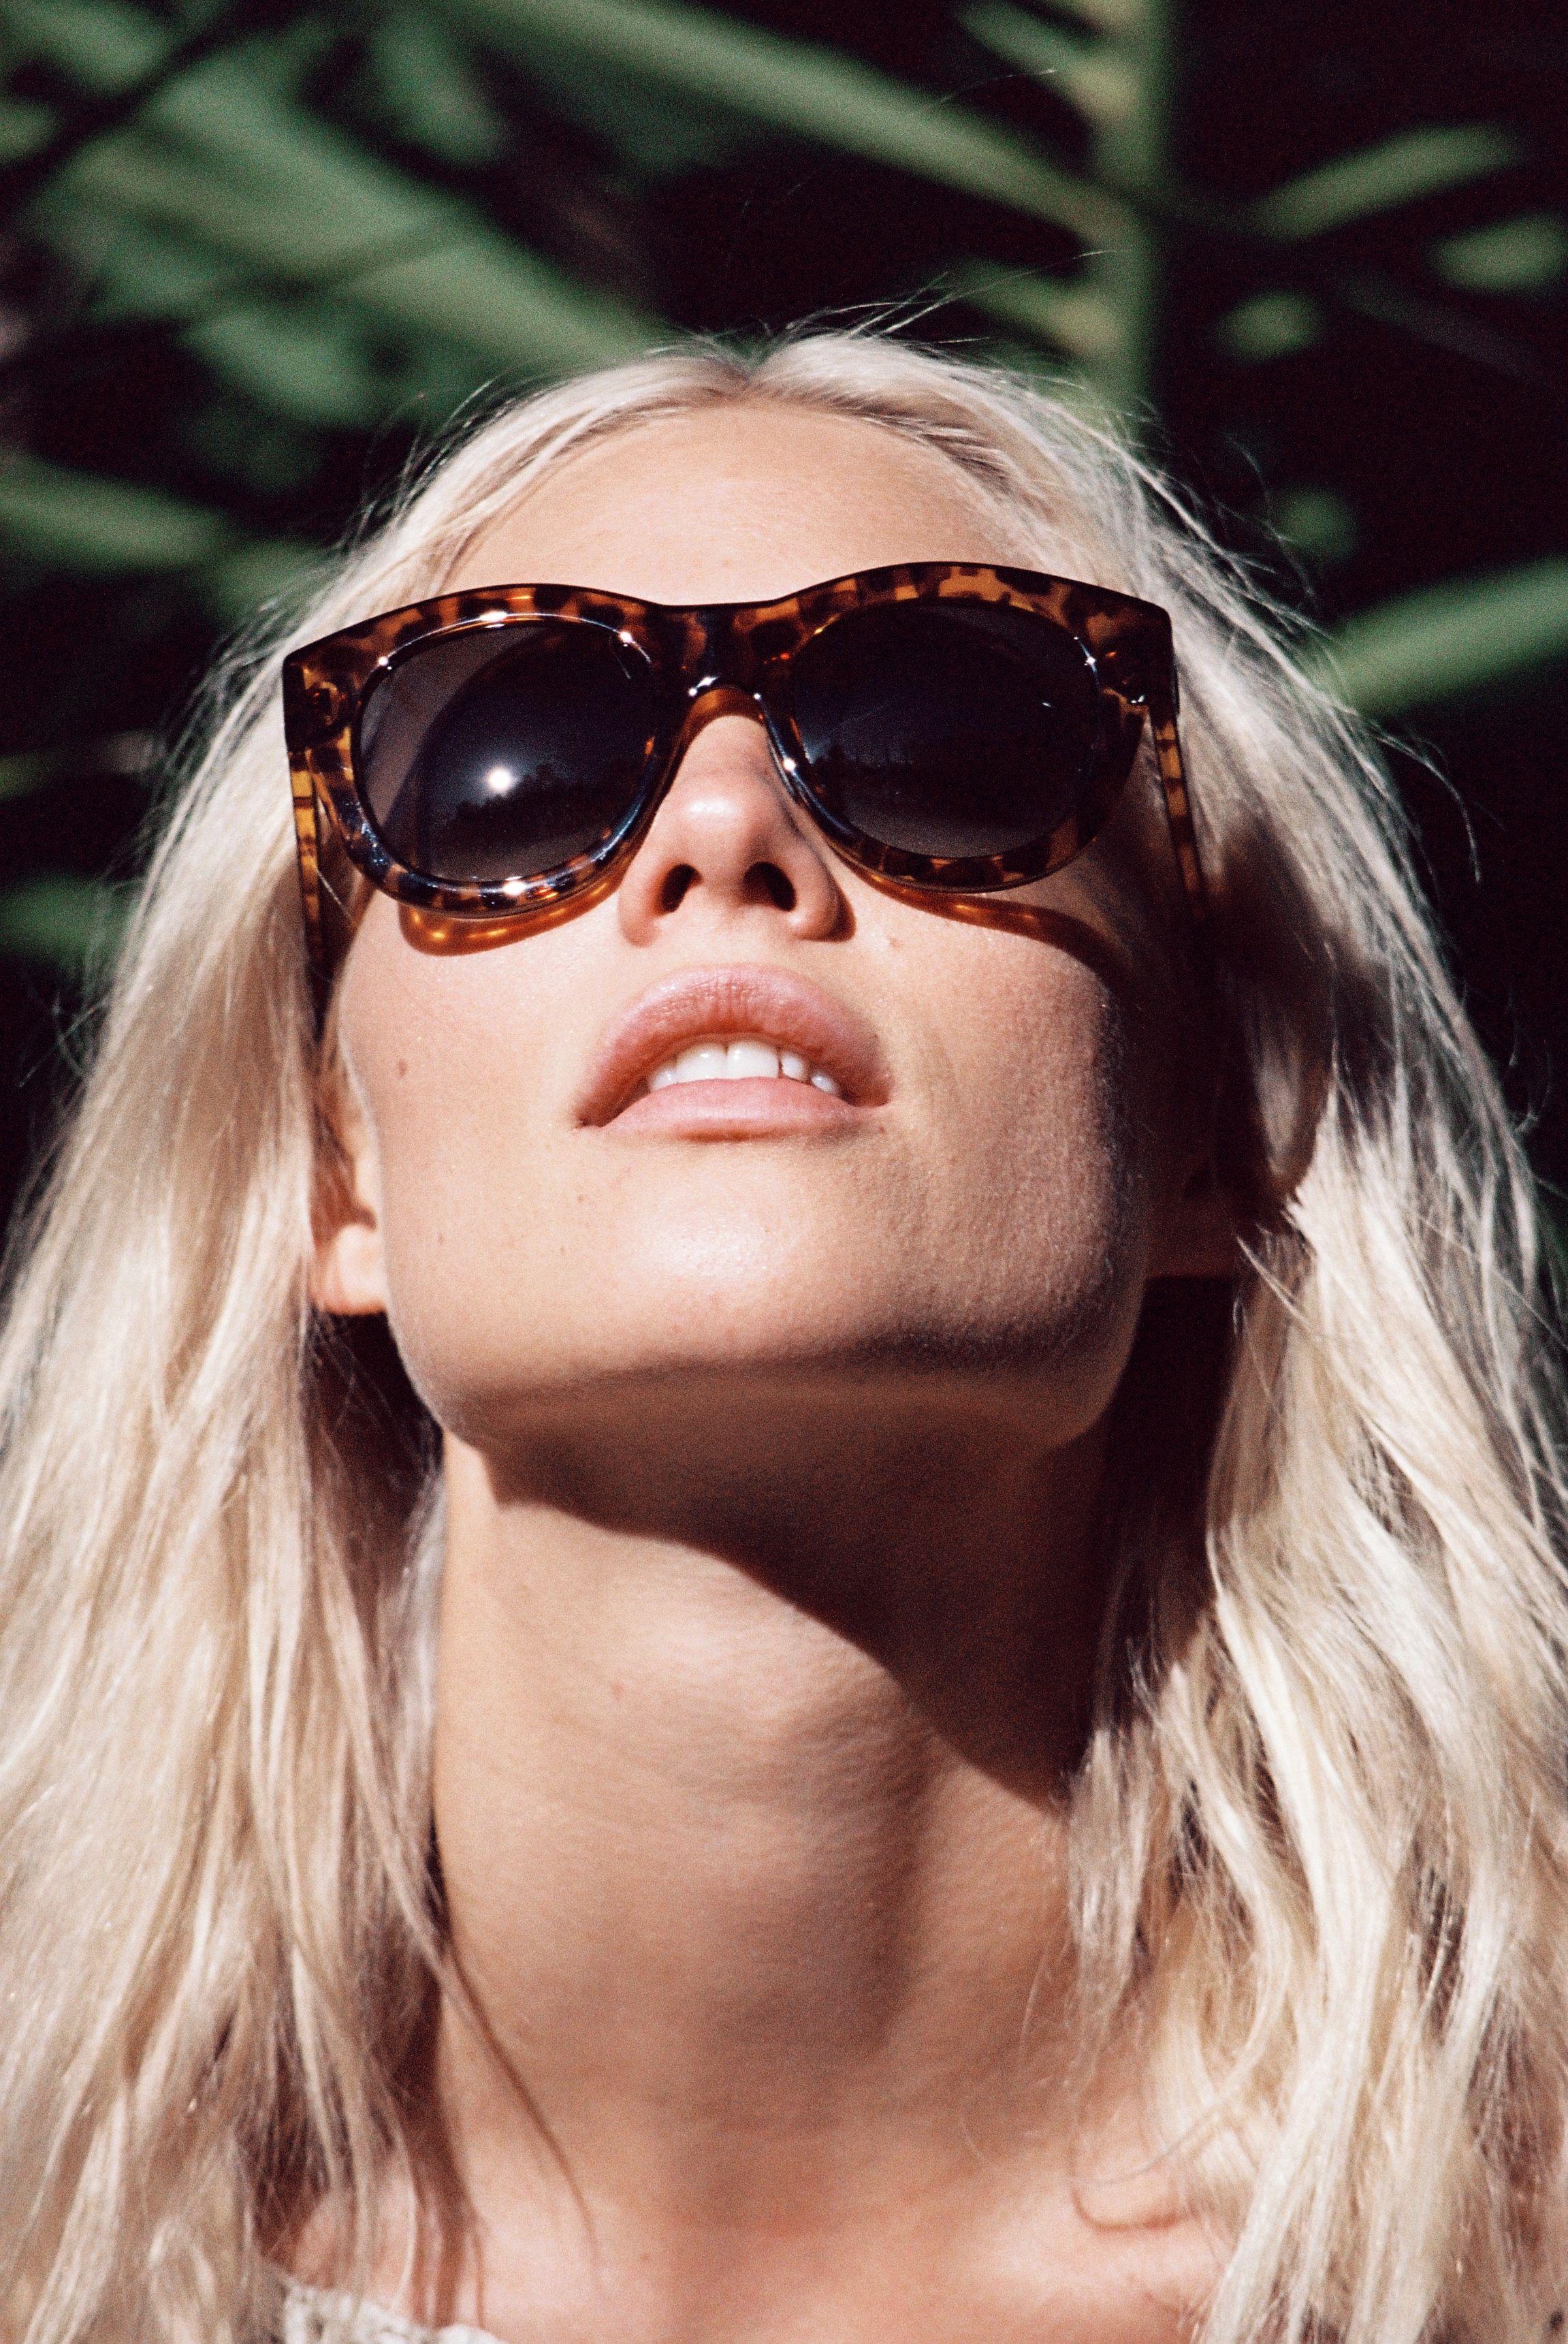 Watch Becca hiller dblanc eyewear ss 2016 campaign hq photo shoot video